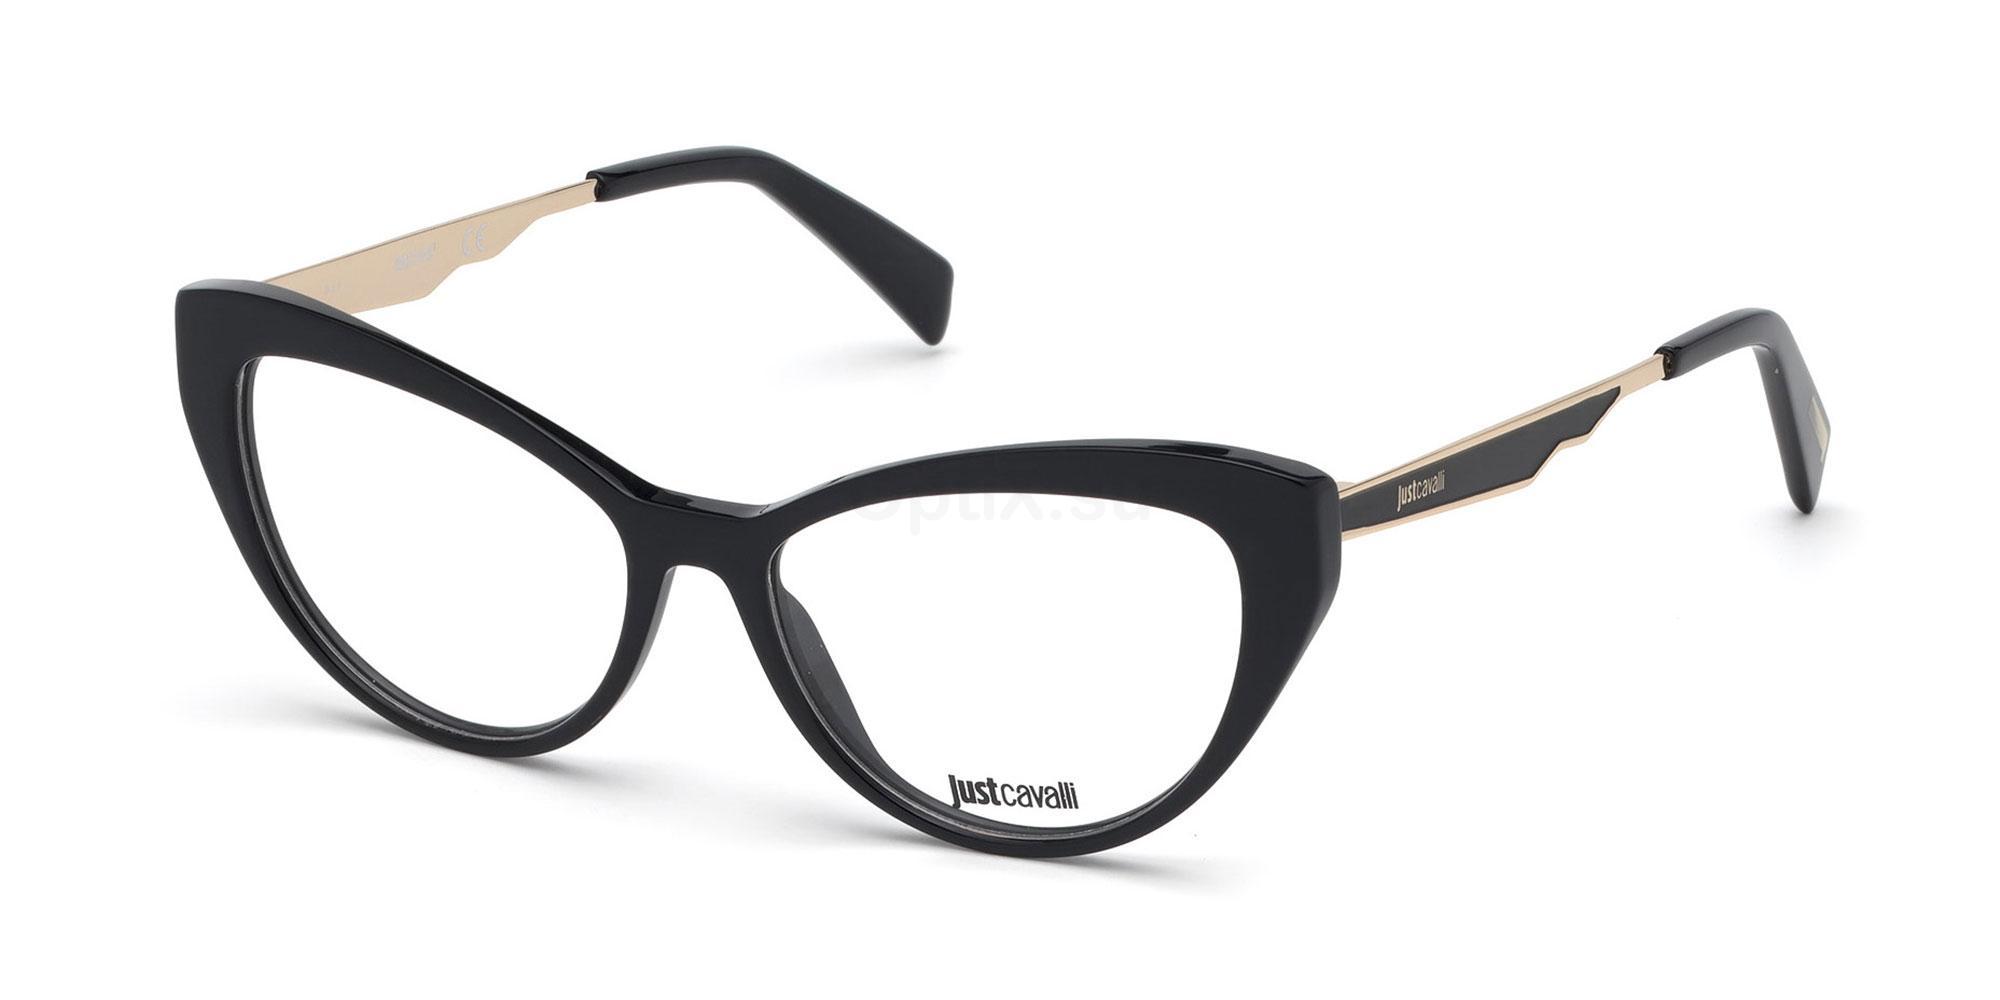 001 JC0881 Glasses, Just Cavalli